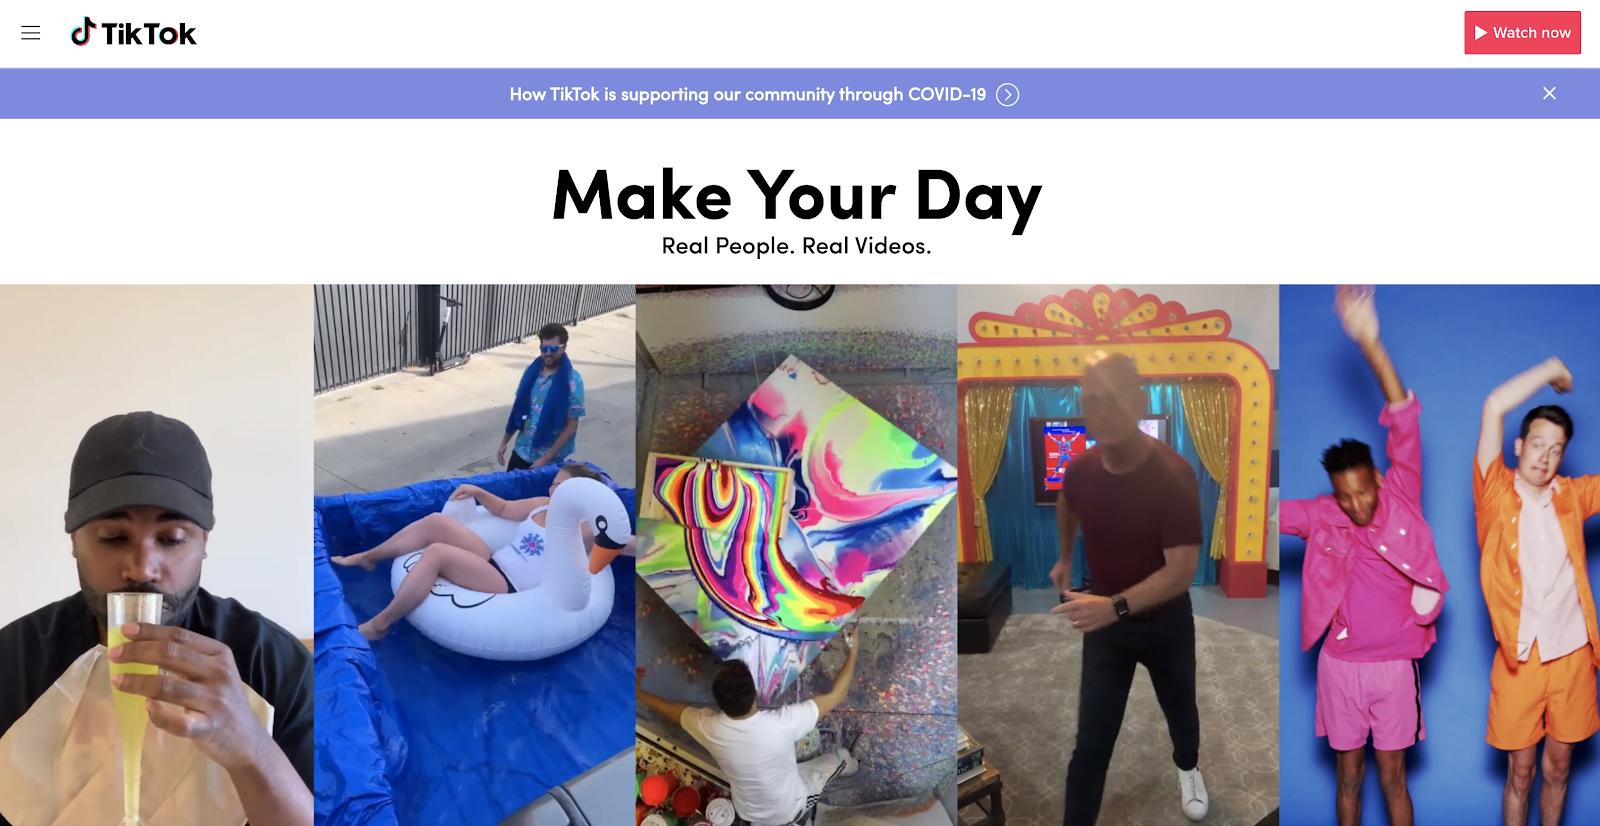 TikTok App Screenshot (for Blog Marketing Strategies)